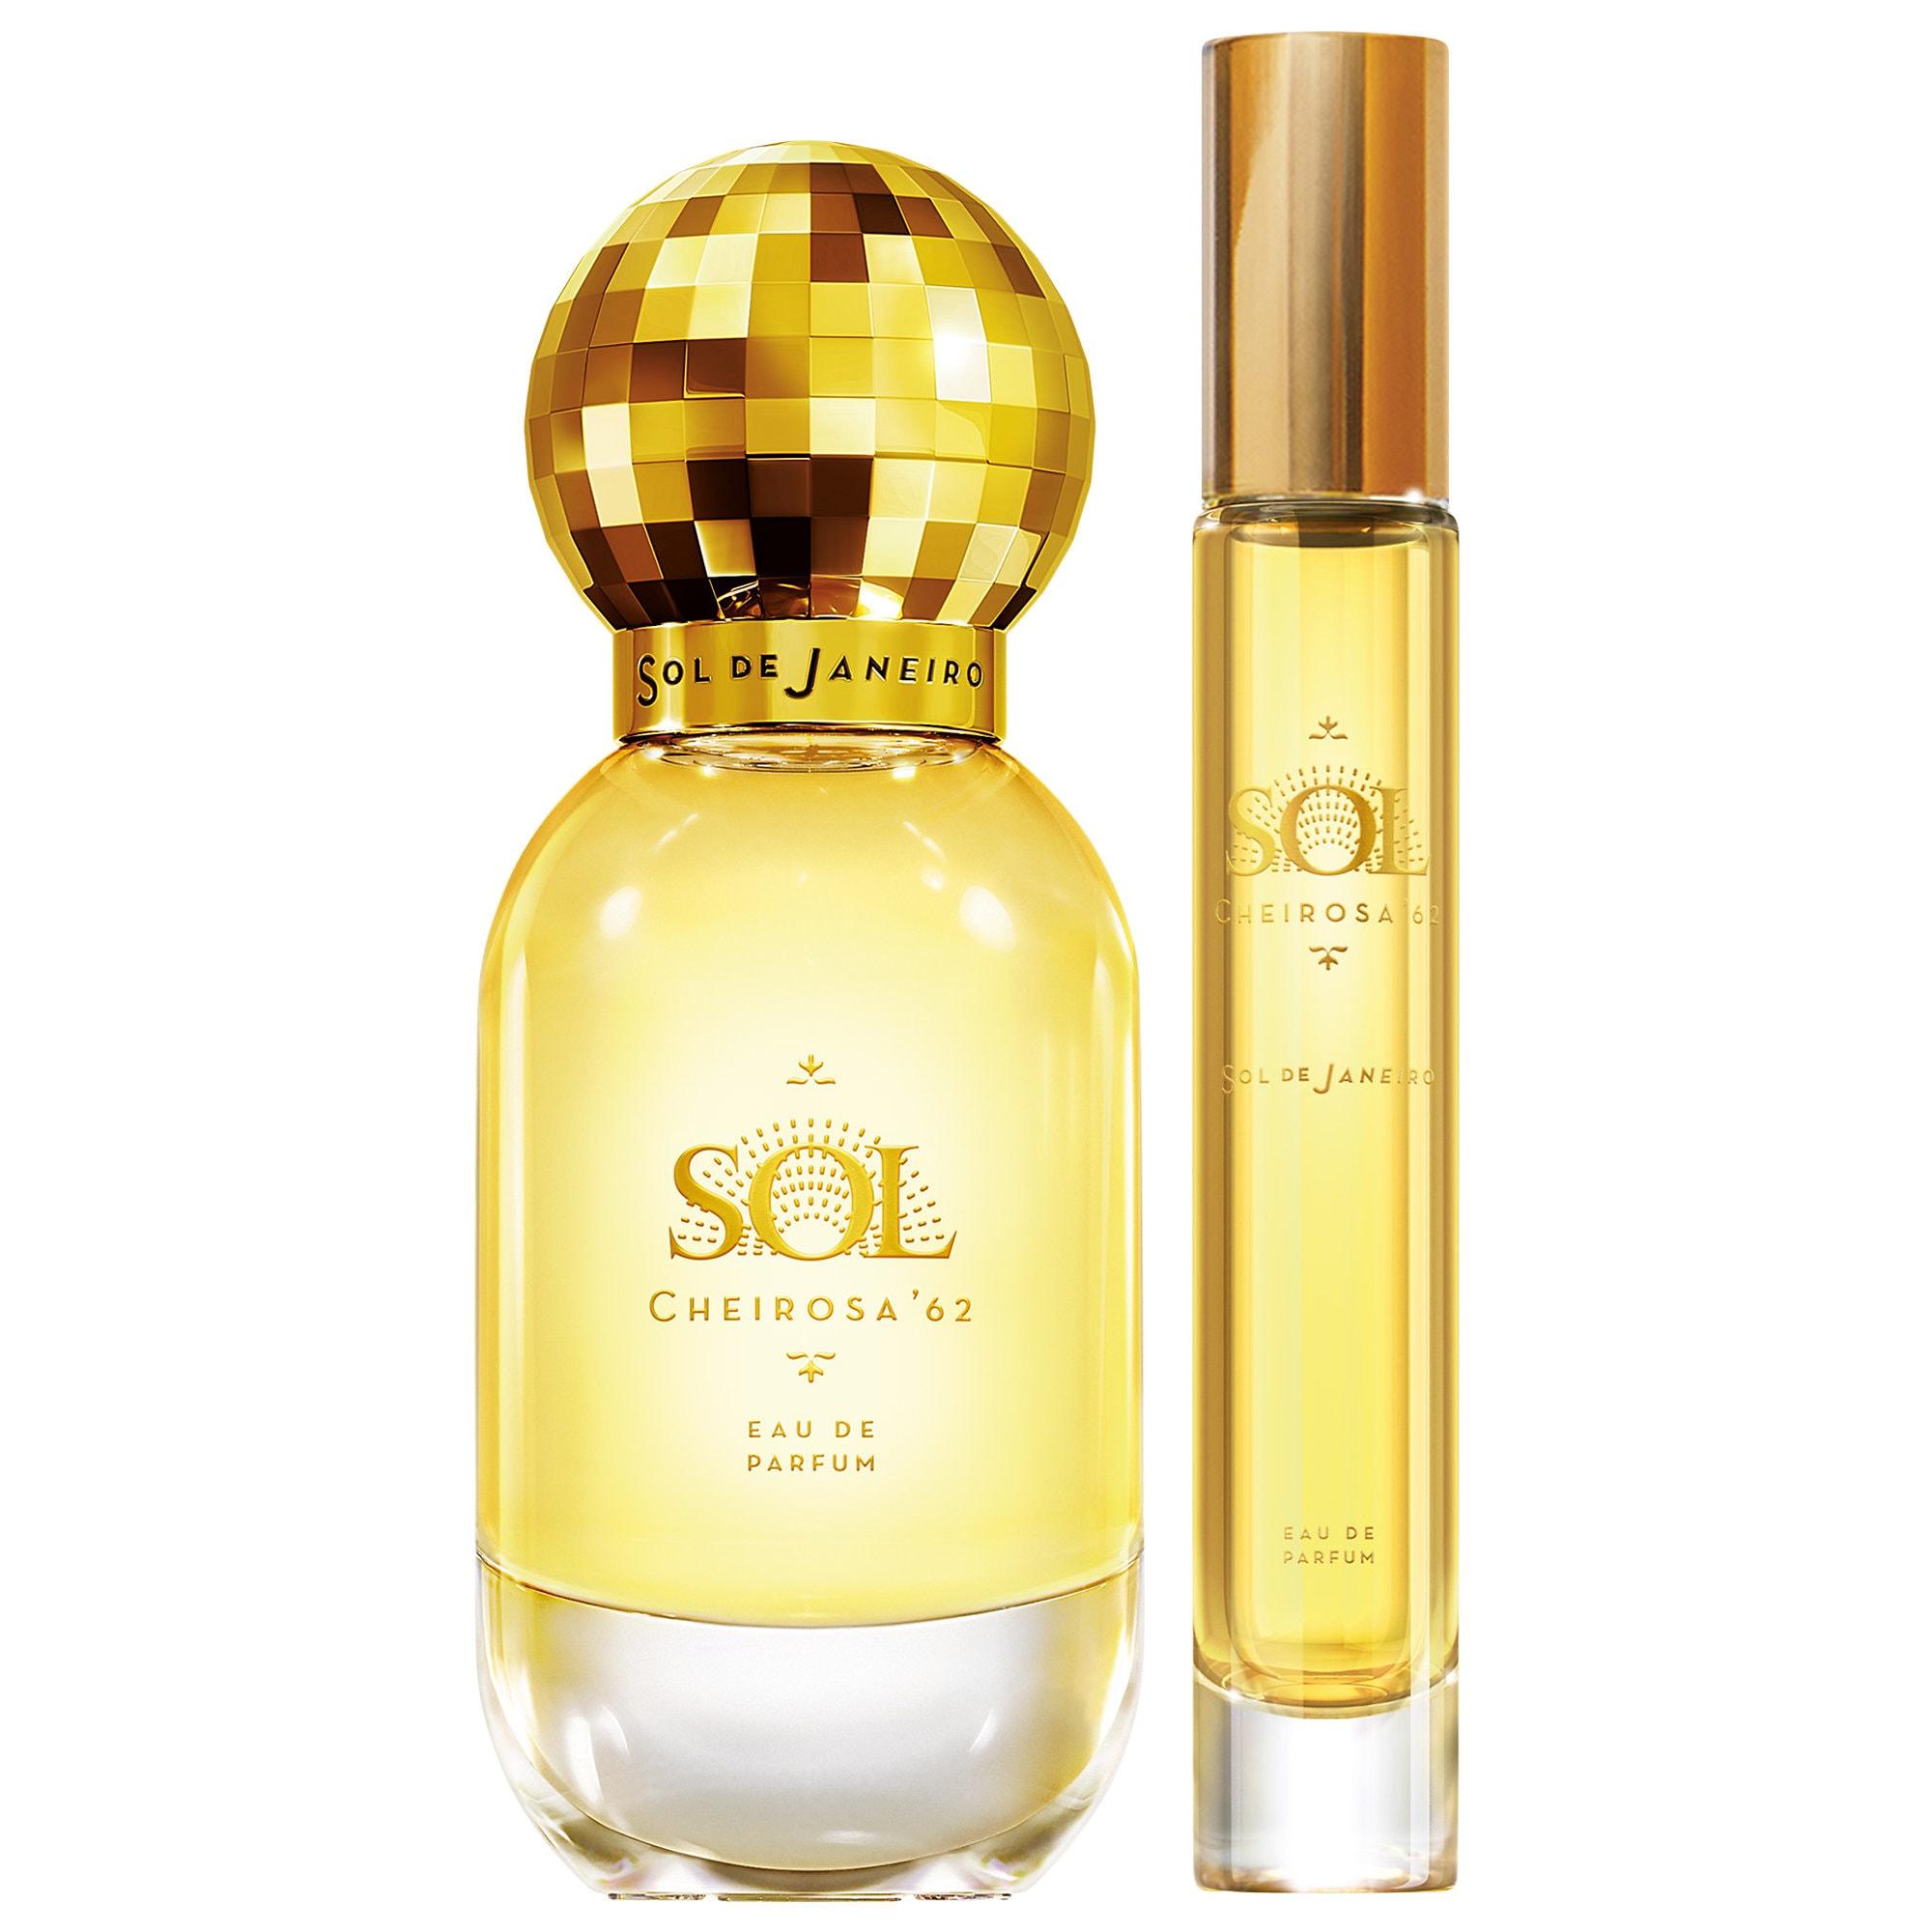 Sol De Janeiro - EDP Cheirosa '62 Holiday Fragrance Set